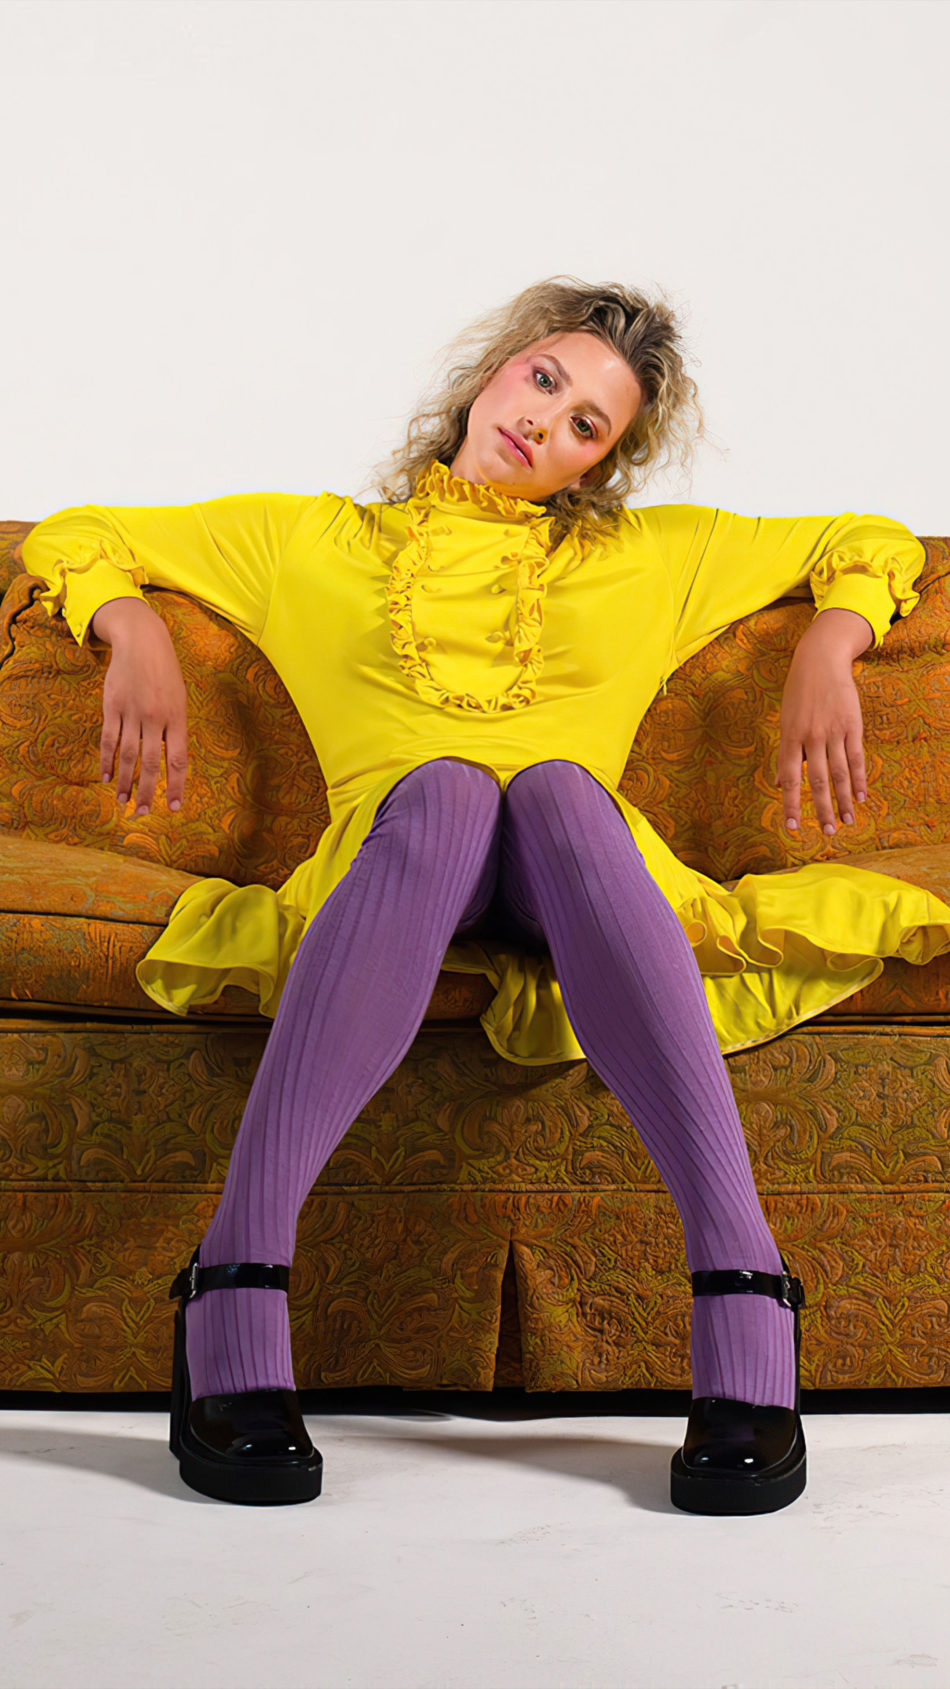 Lili Reinhart 2020 In Yellow Dress 4K Ultra HD Mobile Wallpaper